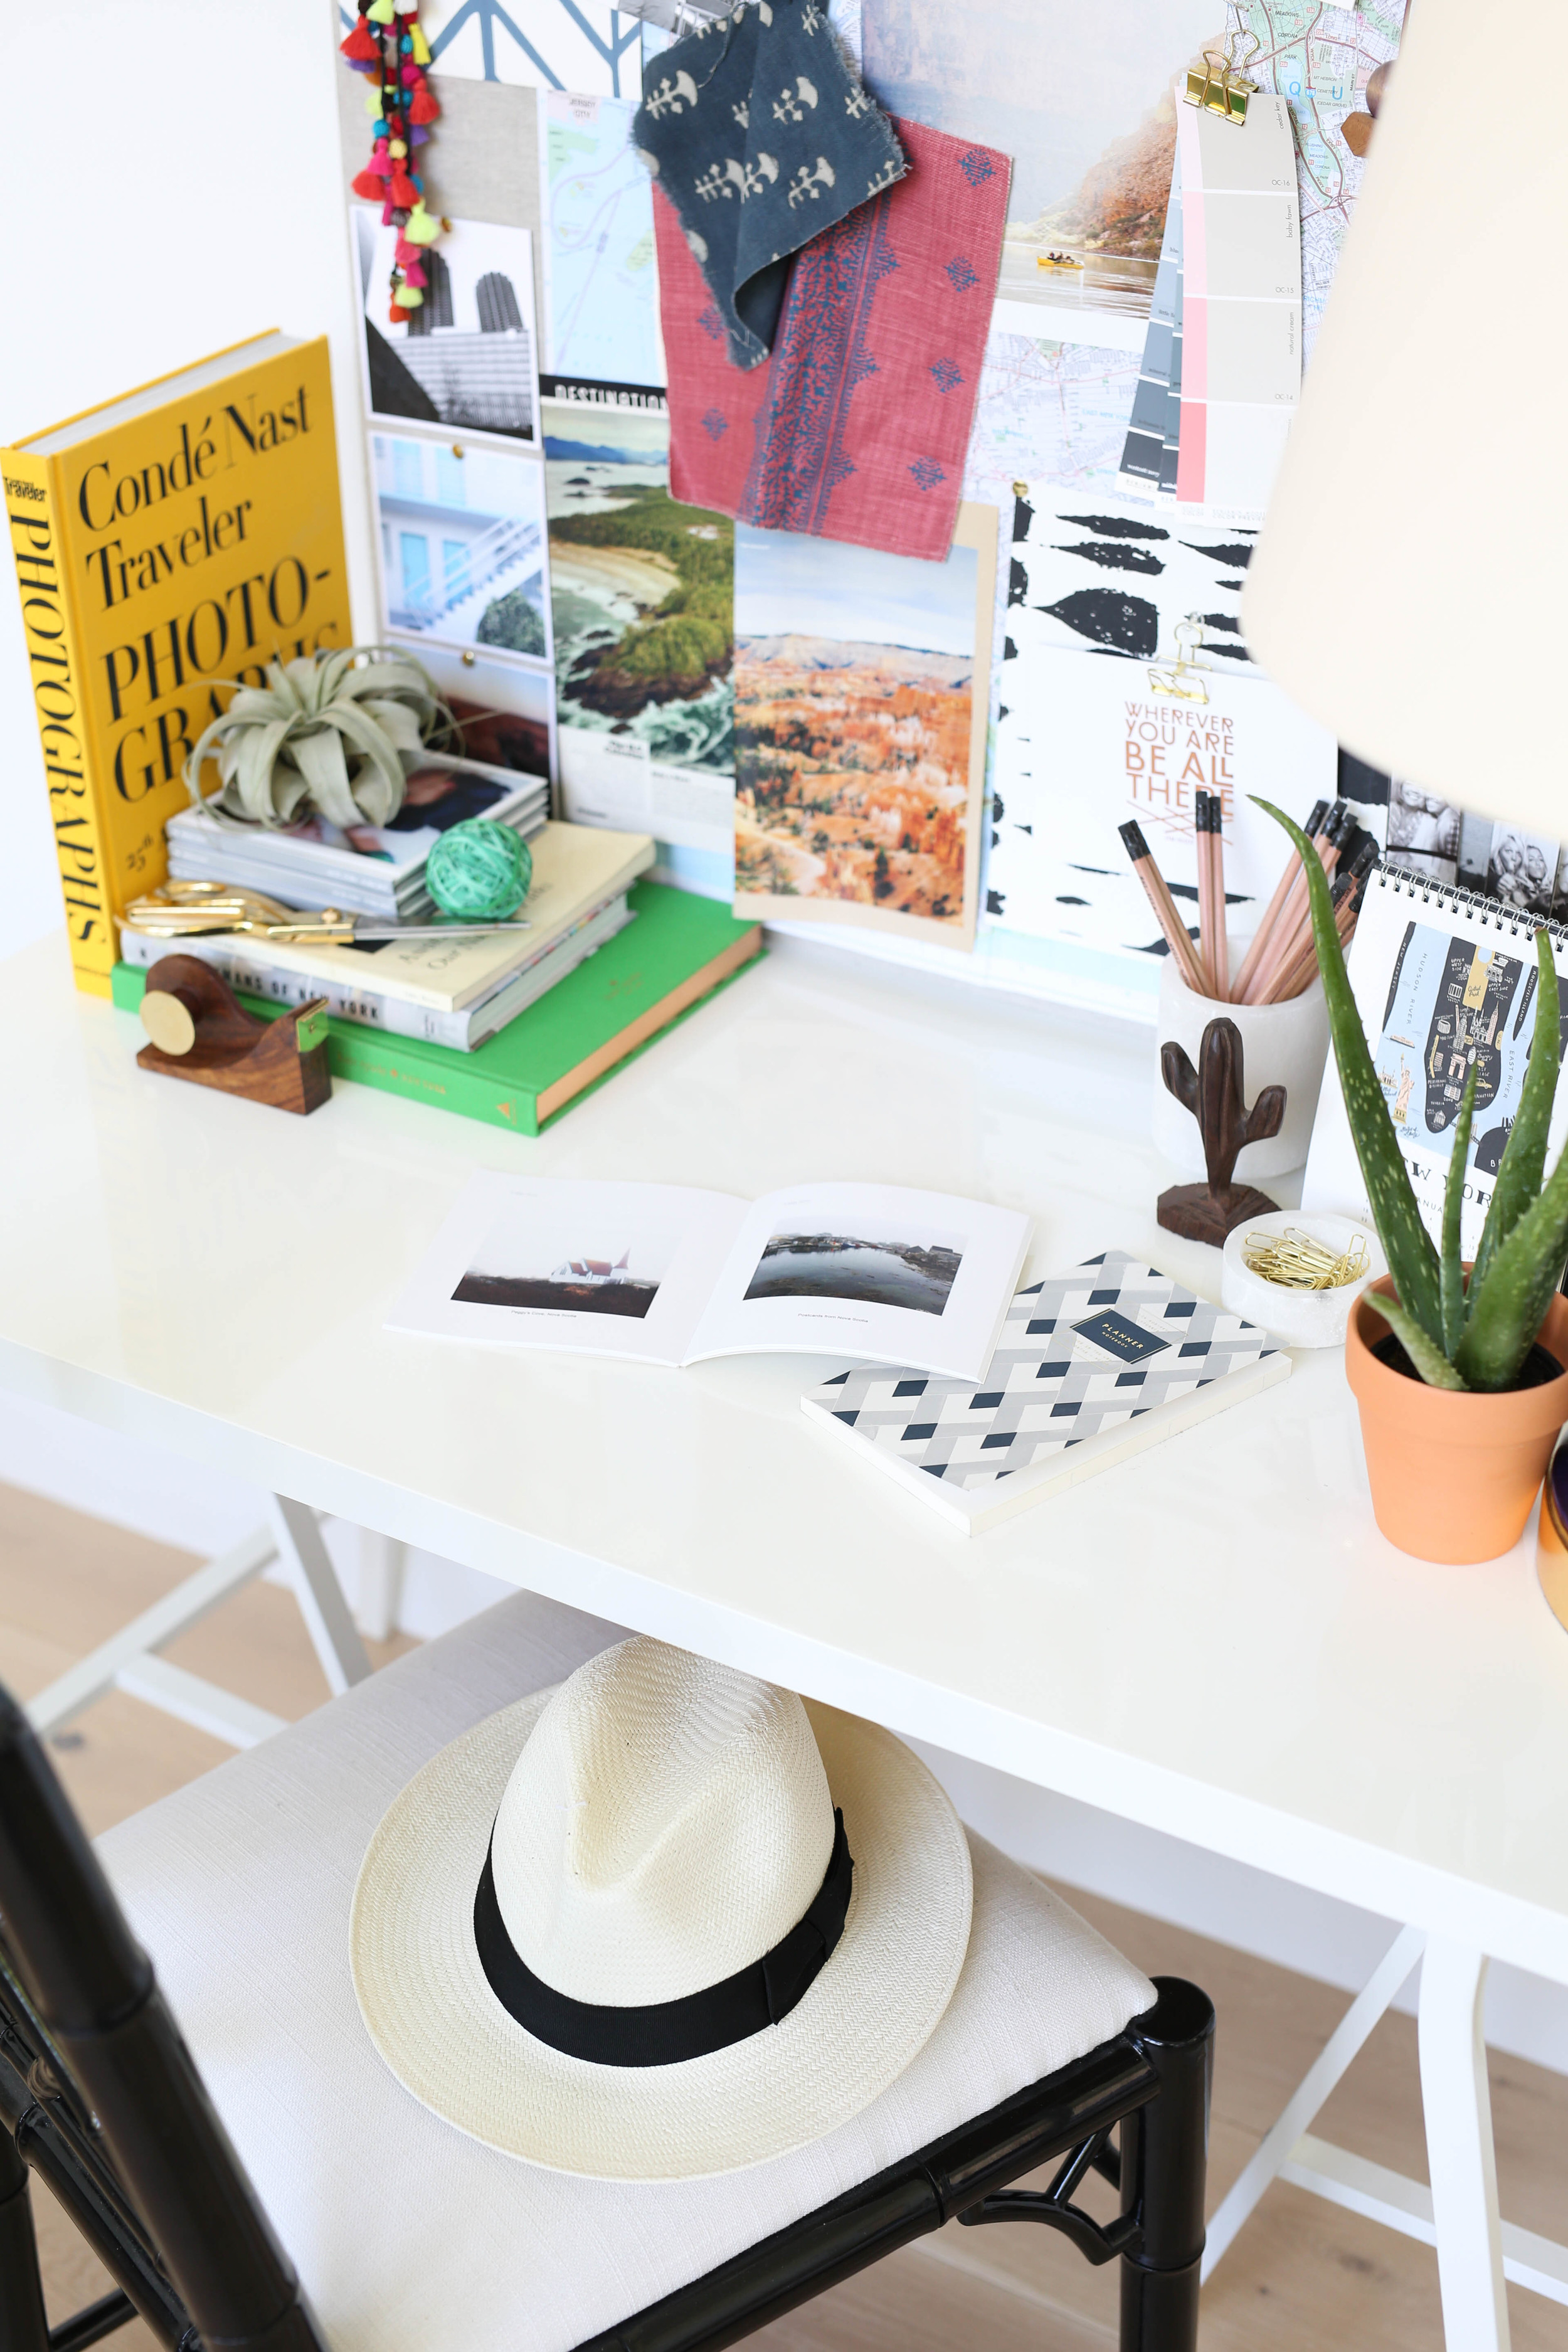 3 Ways to Style Printed Photos